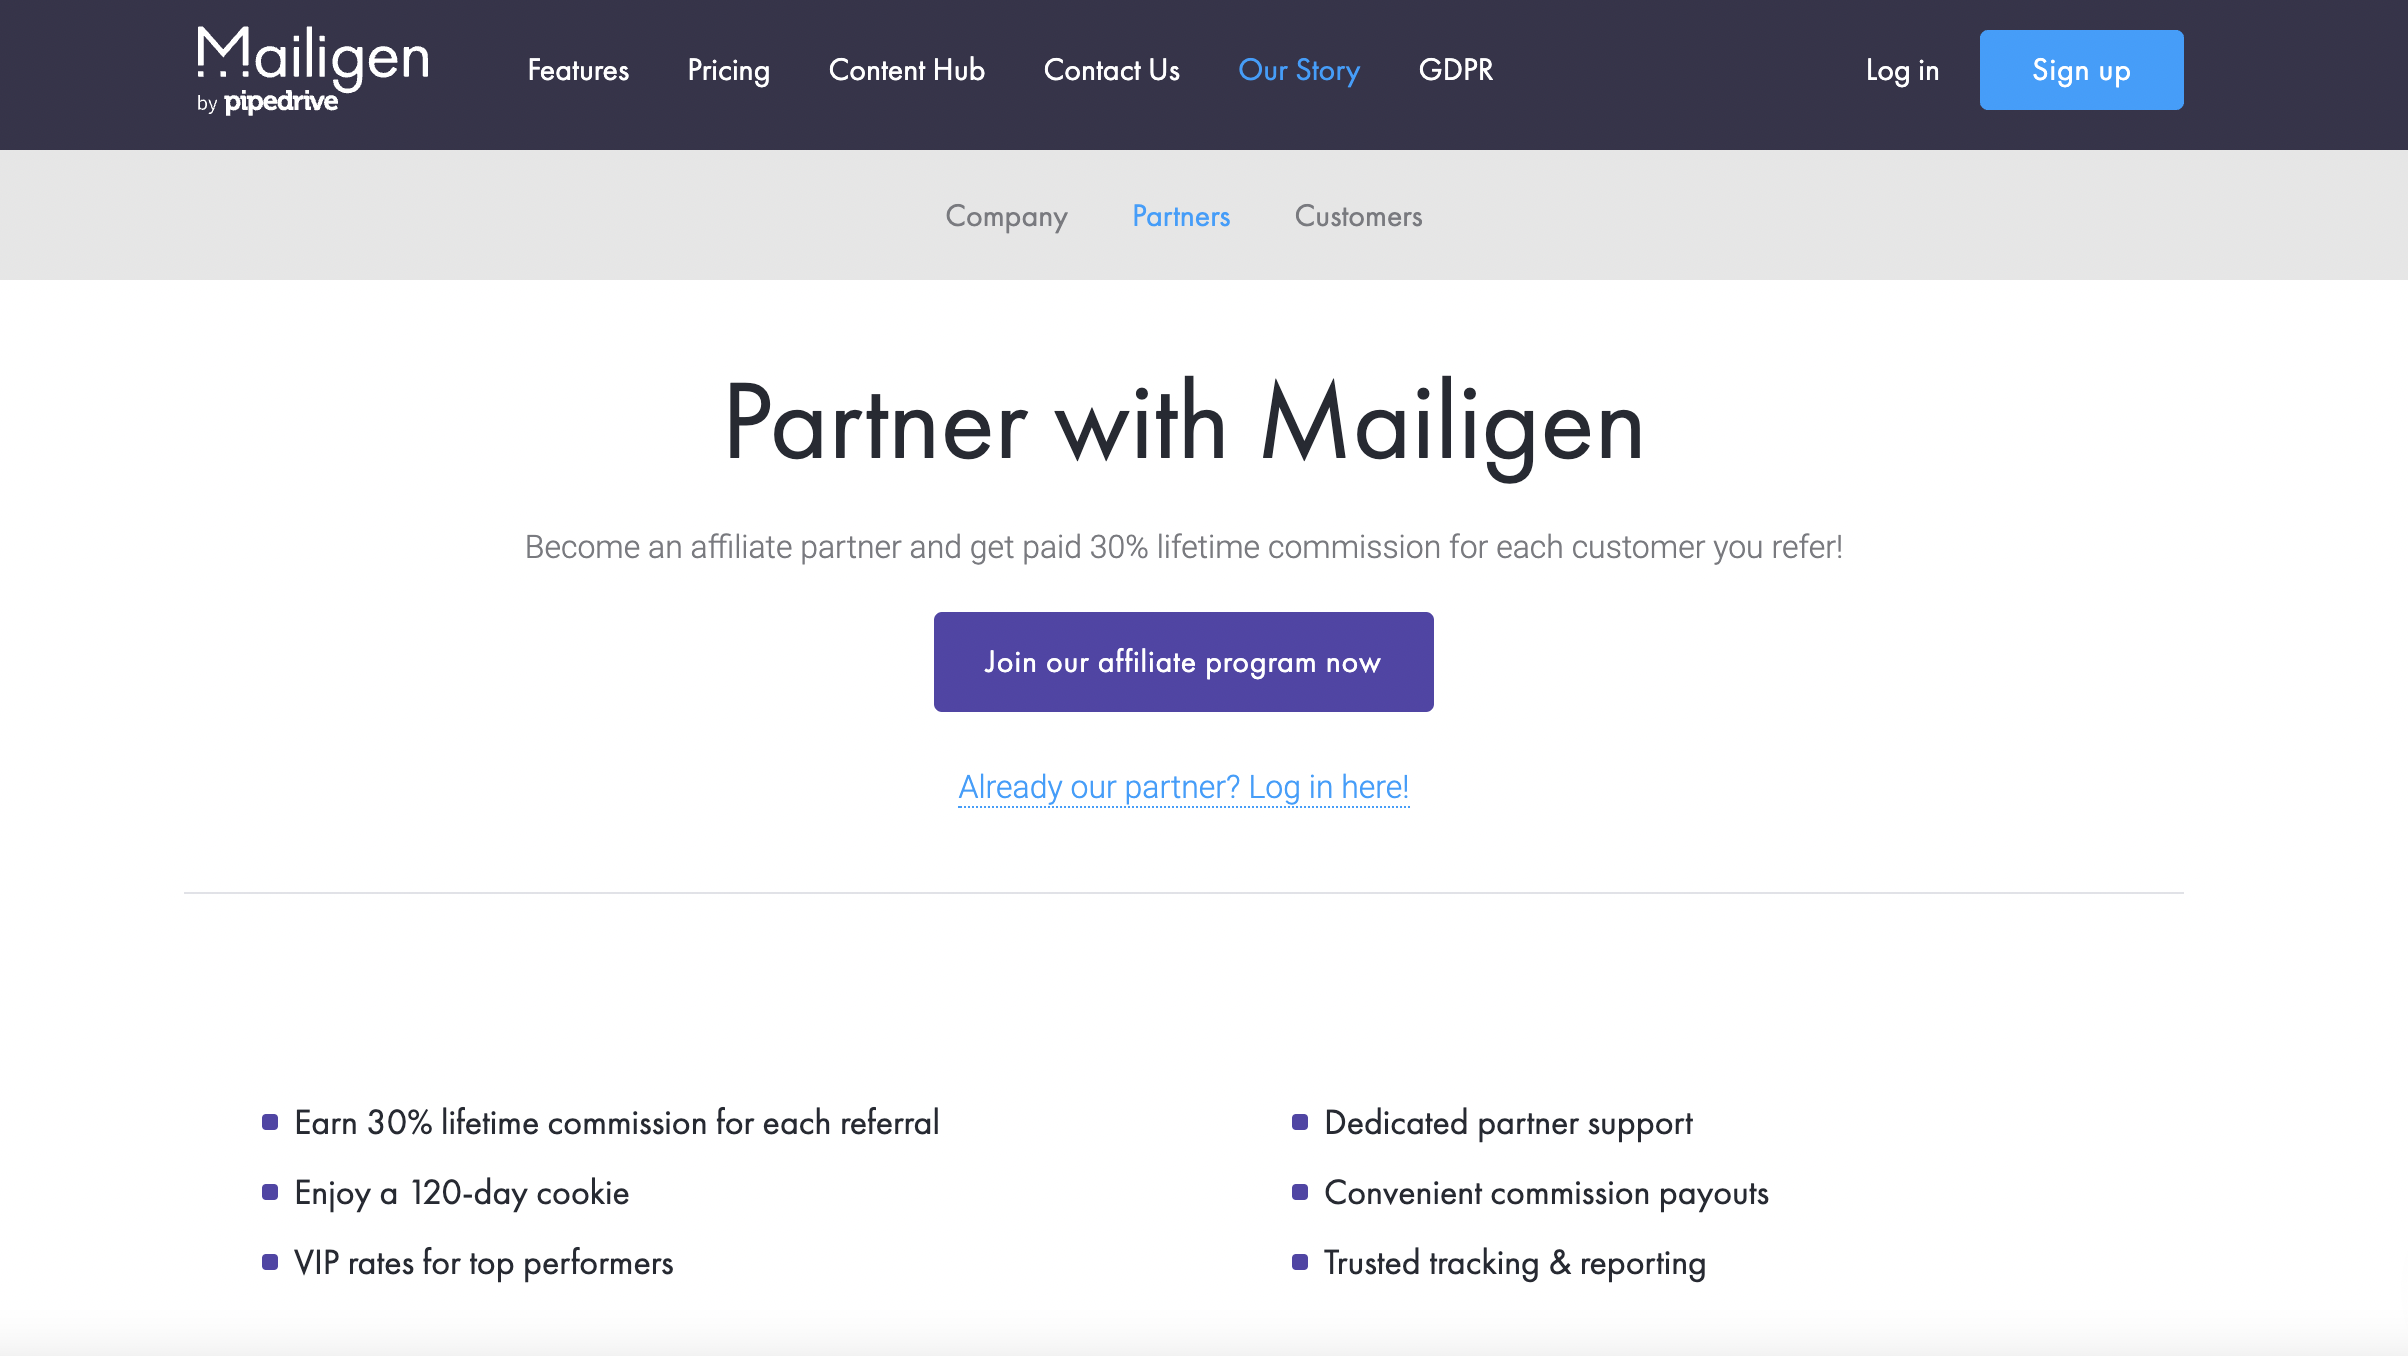 Partner program page from Mailigen.